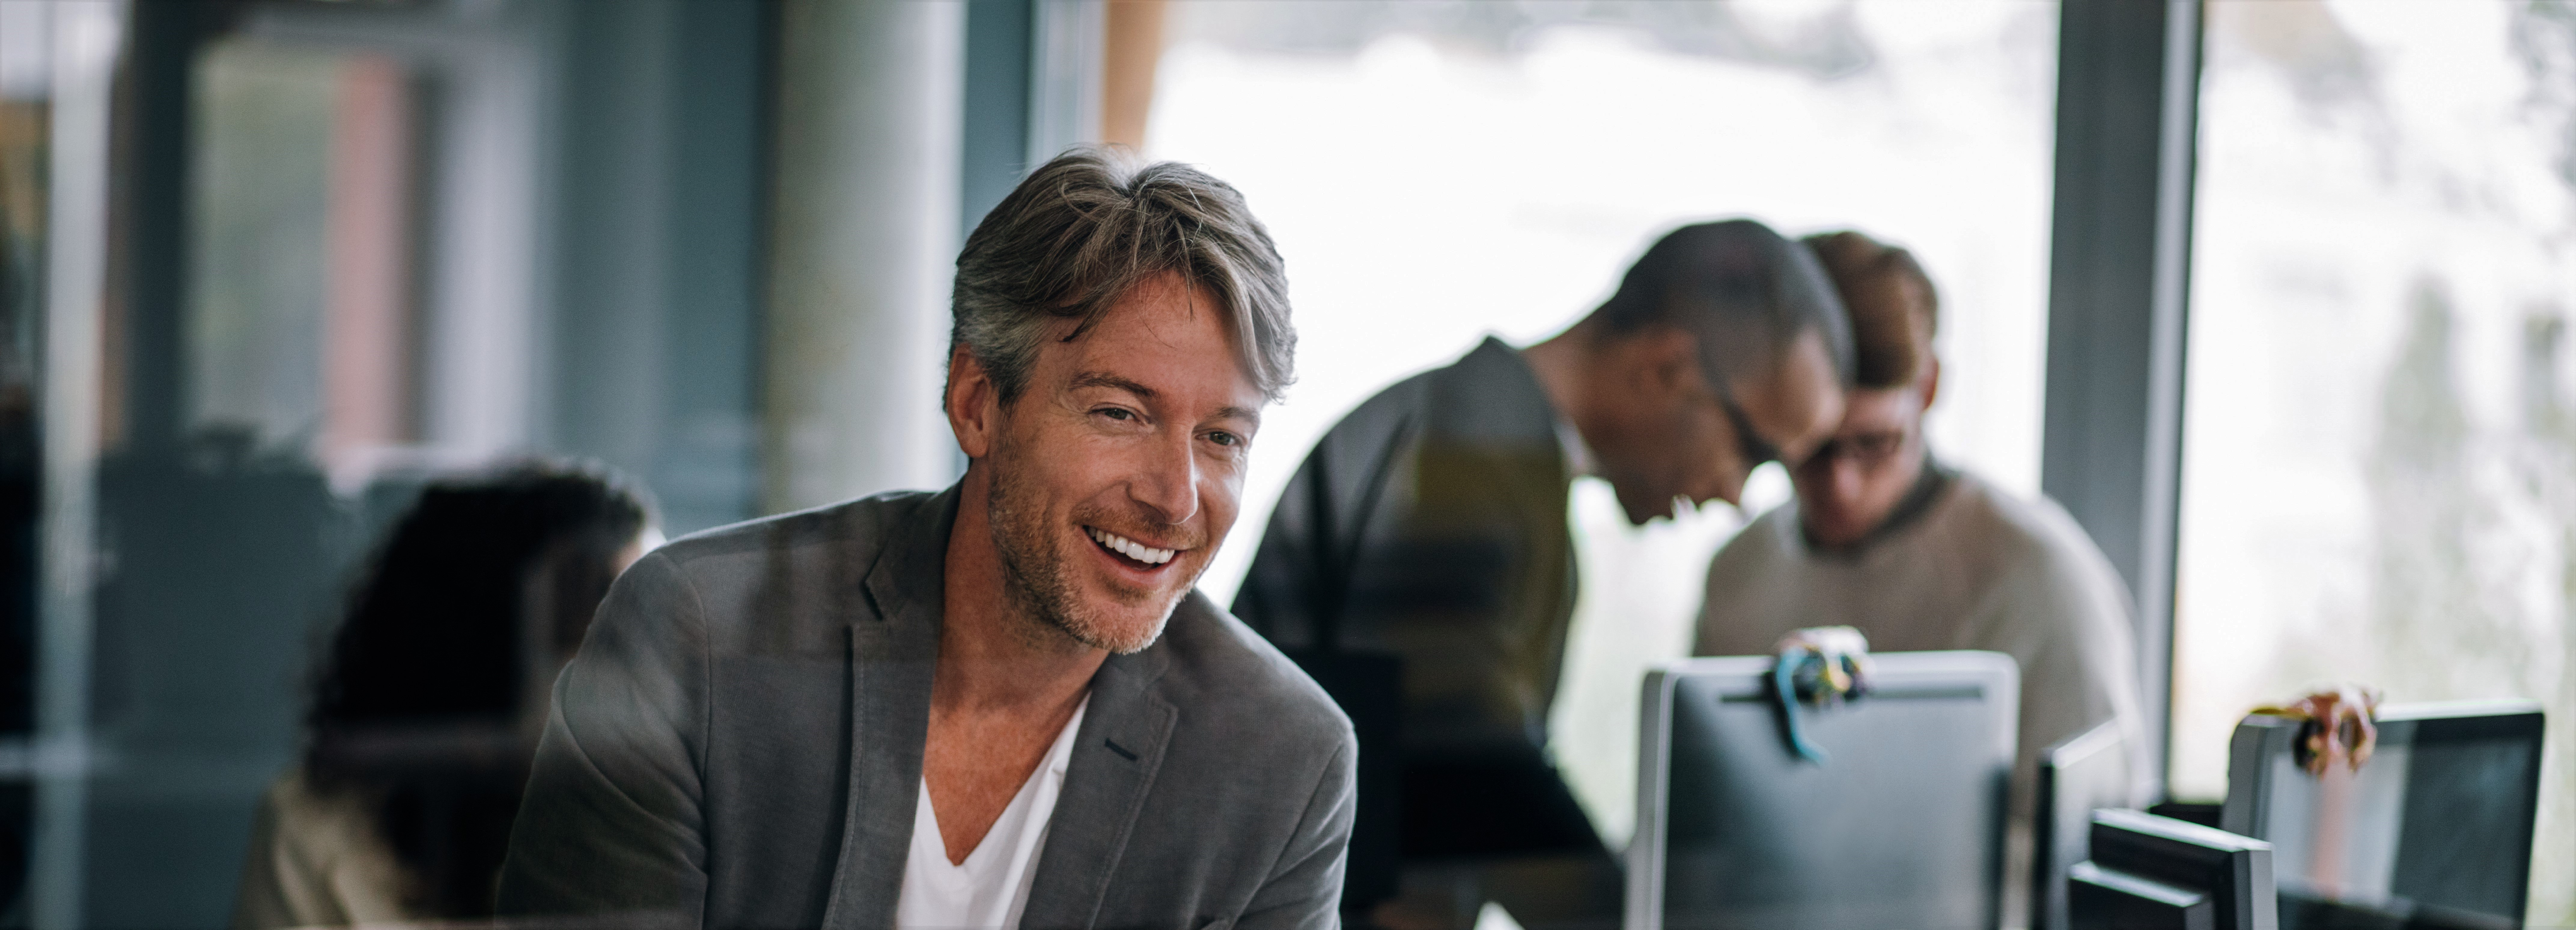 Redefining leadership effectiveness